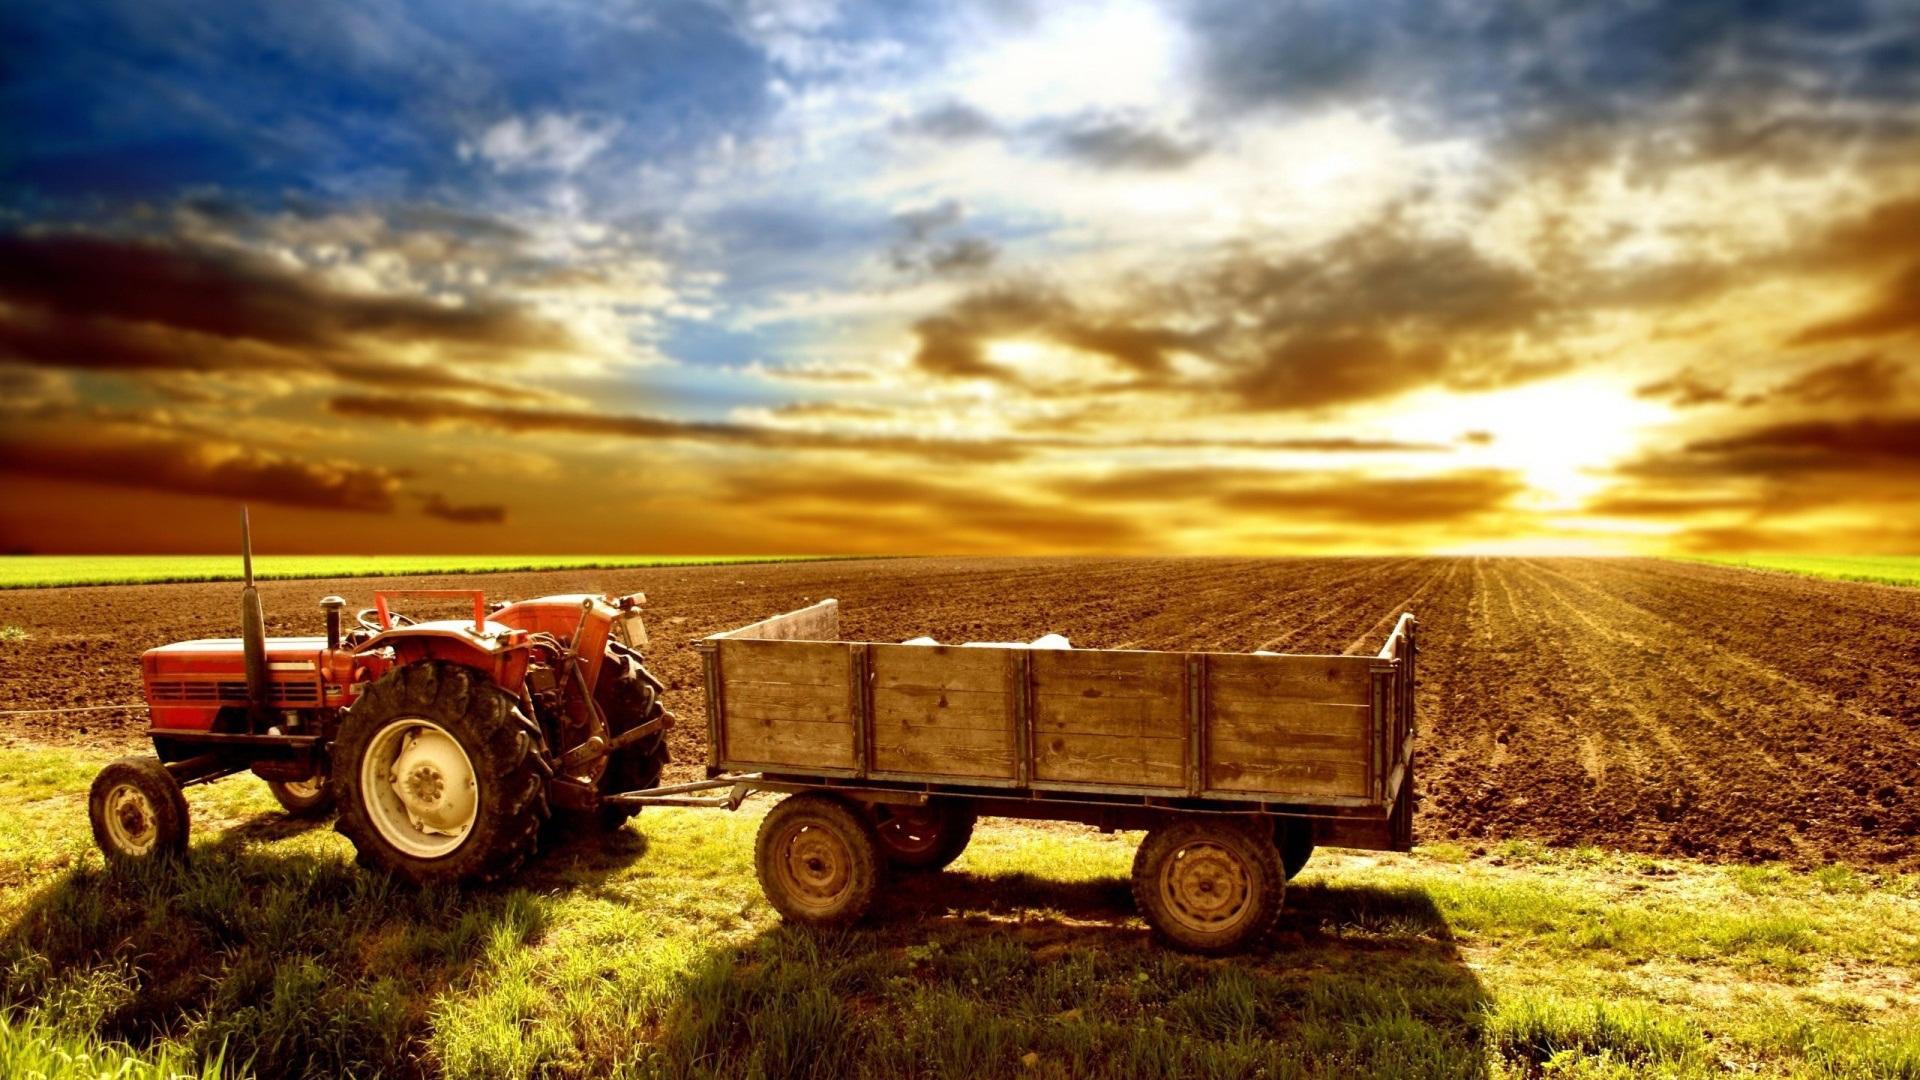 Farming Wallpaper 11617   Baltana 1920x1080